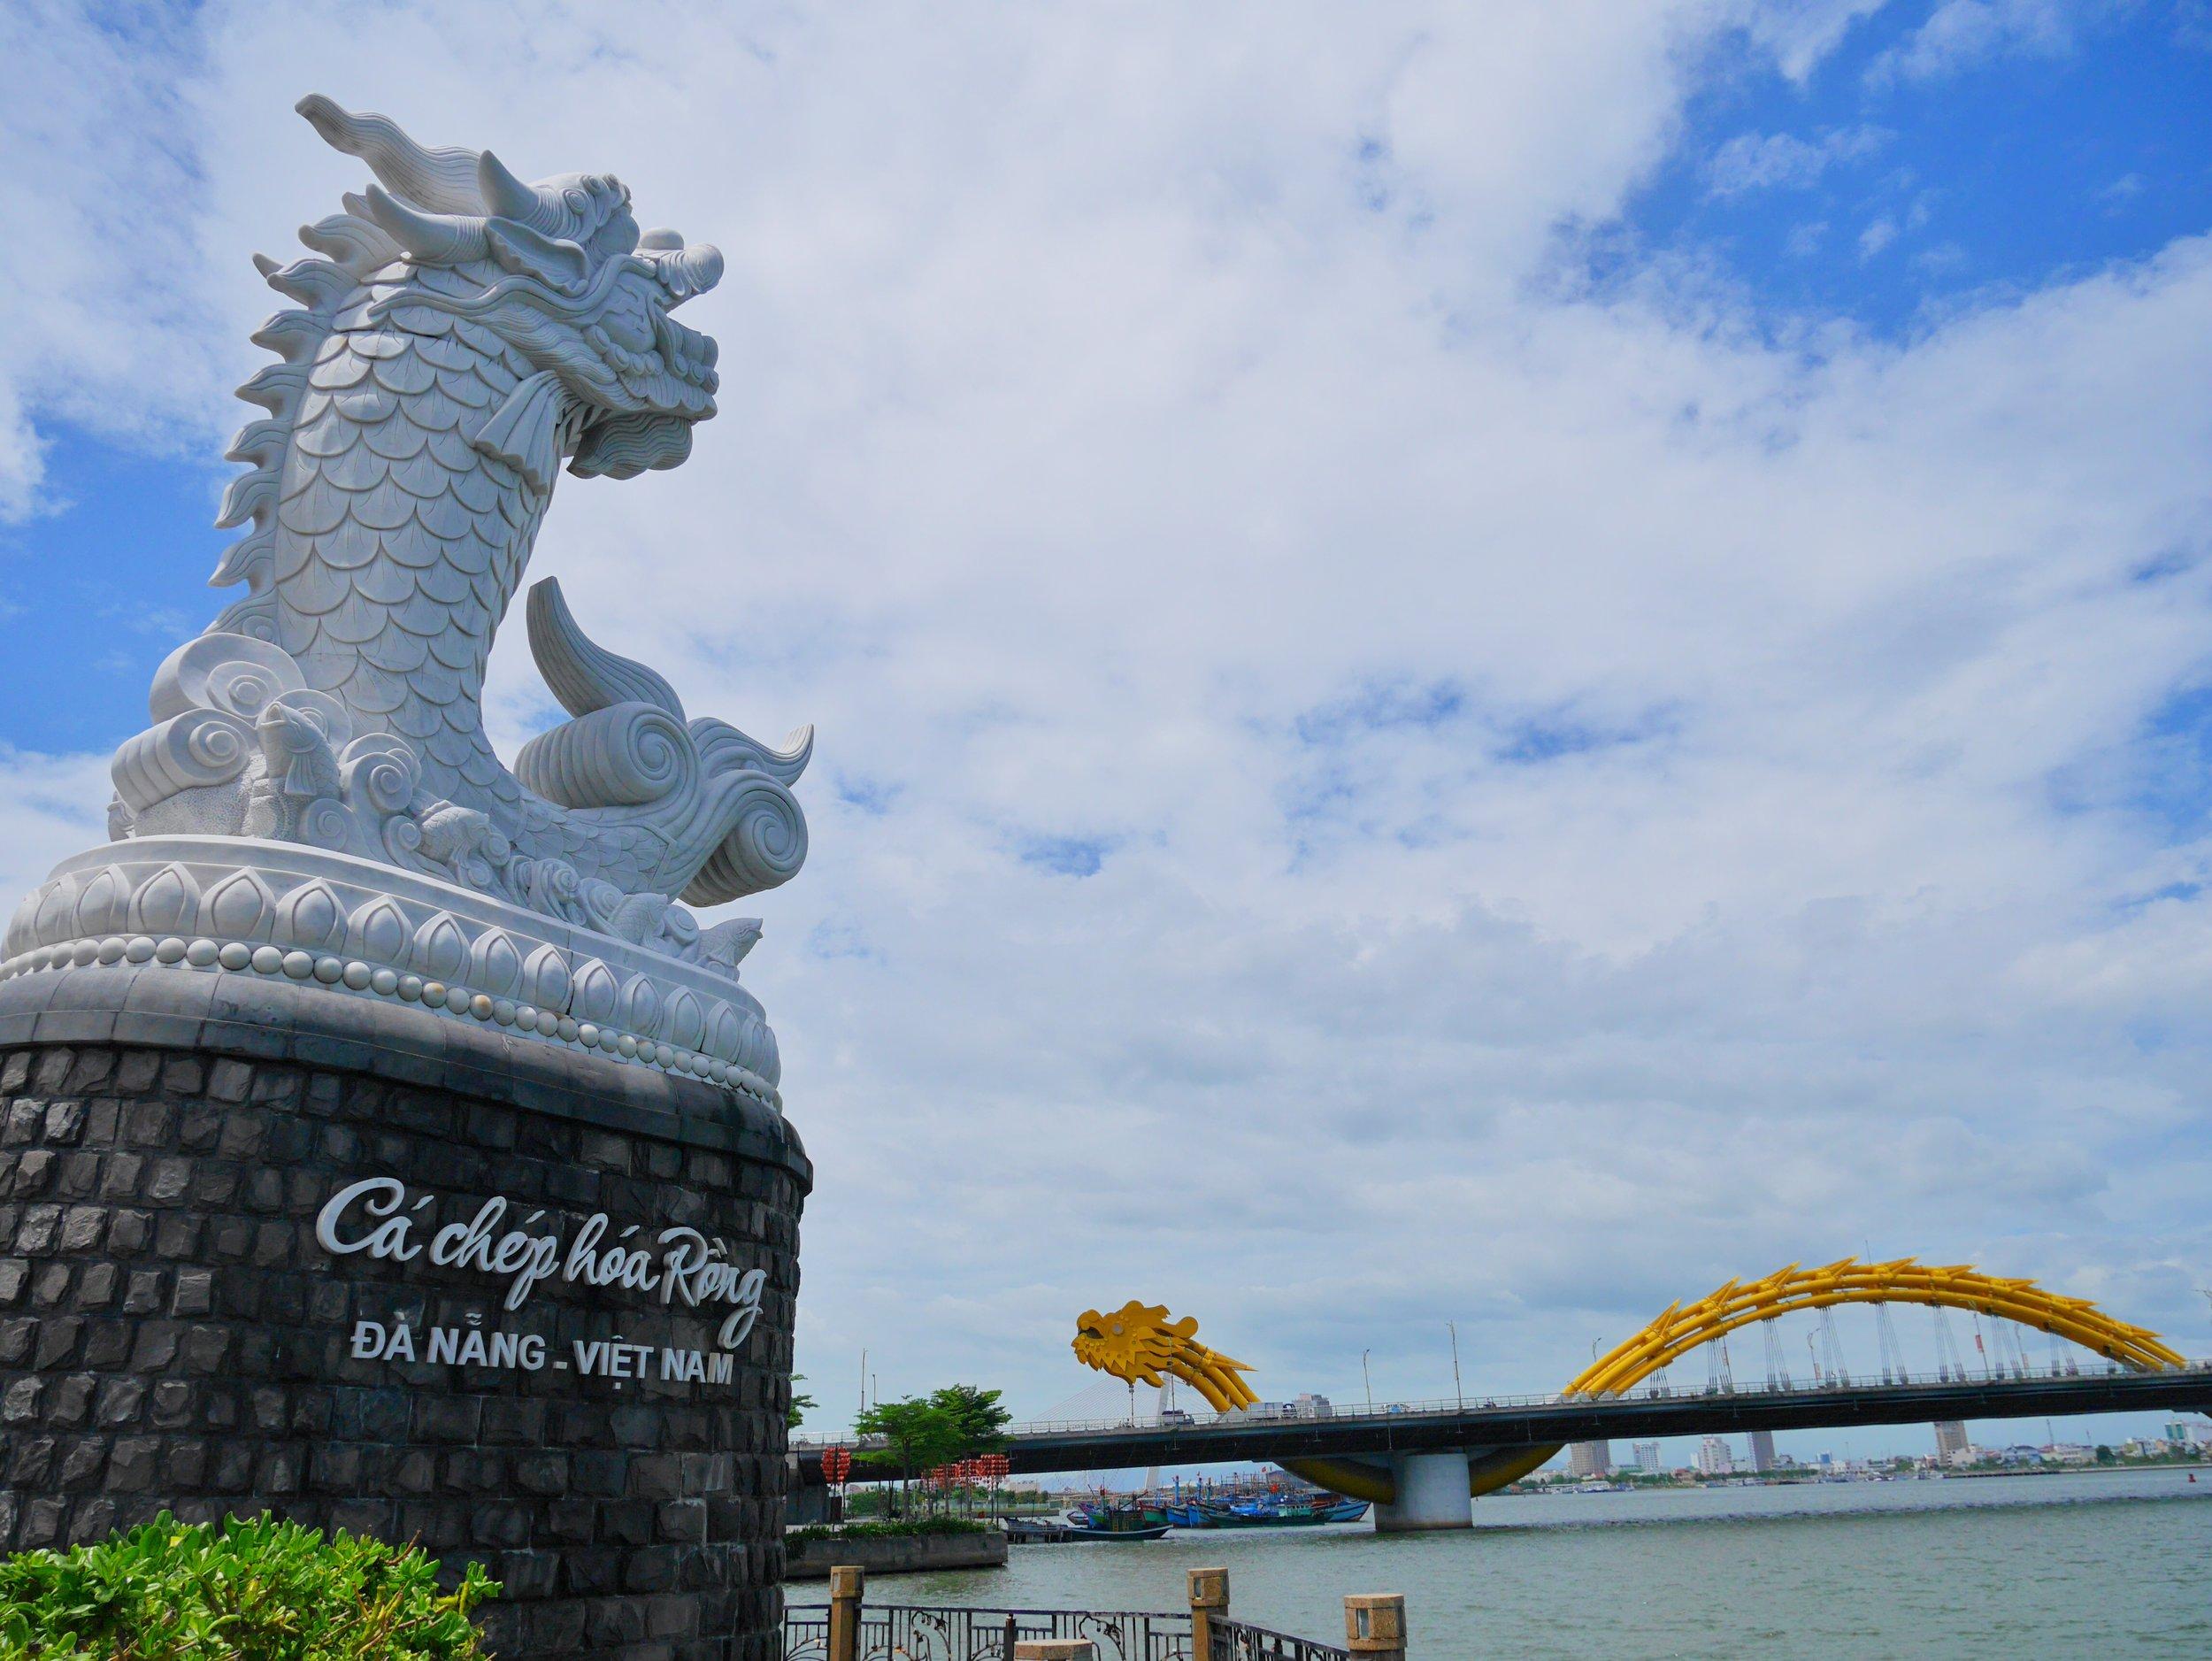 Han River in Da Nang, Vietnam; the Dragon Carp and the Dragon Bridge